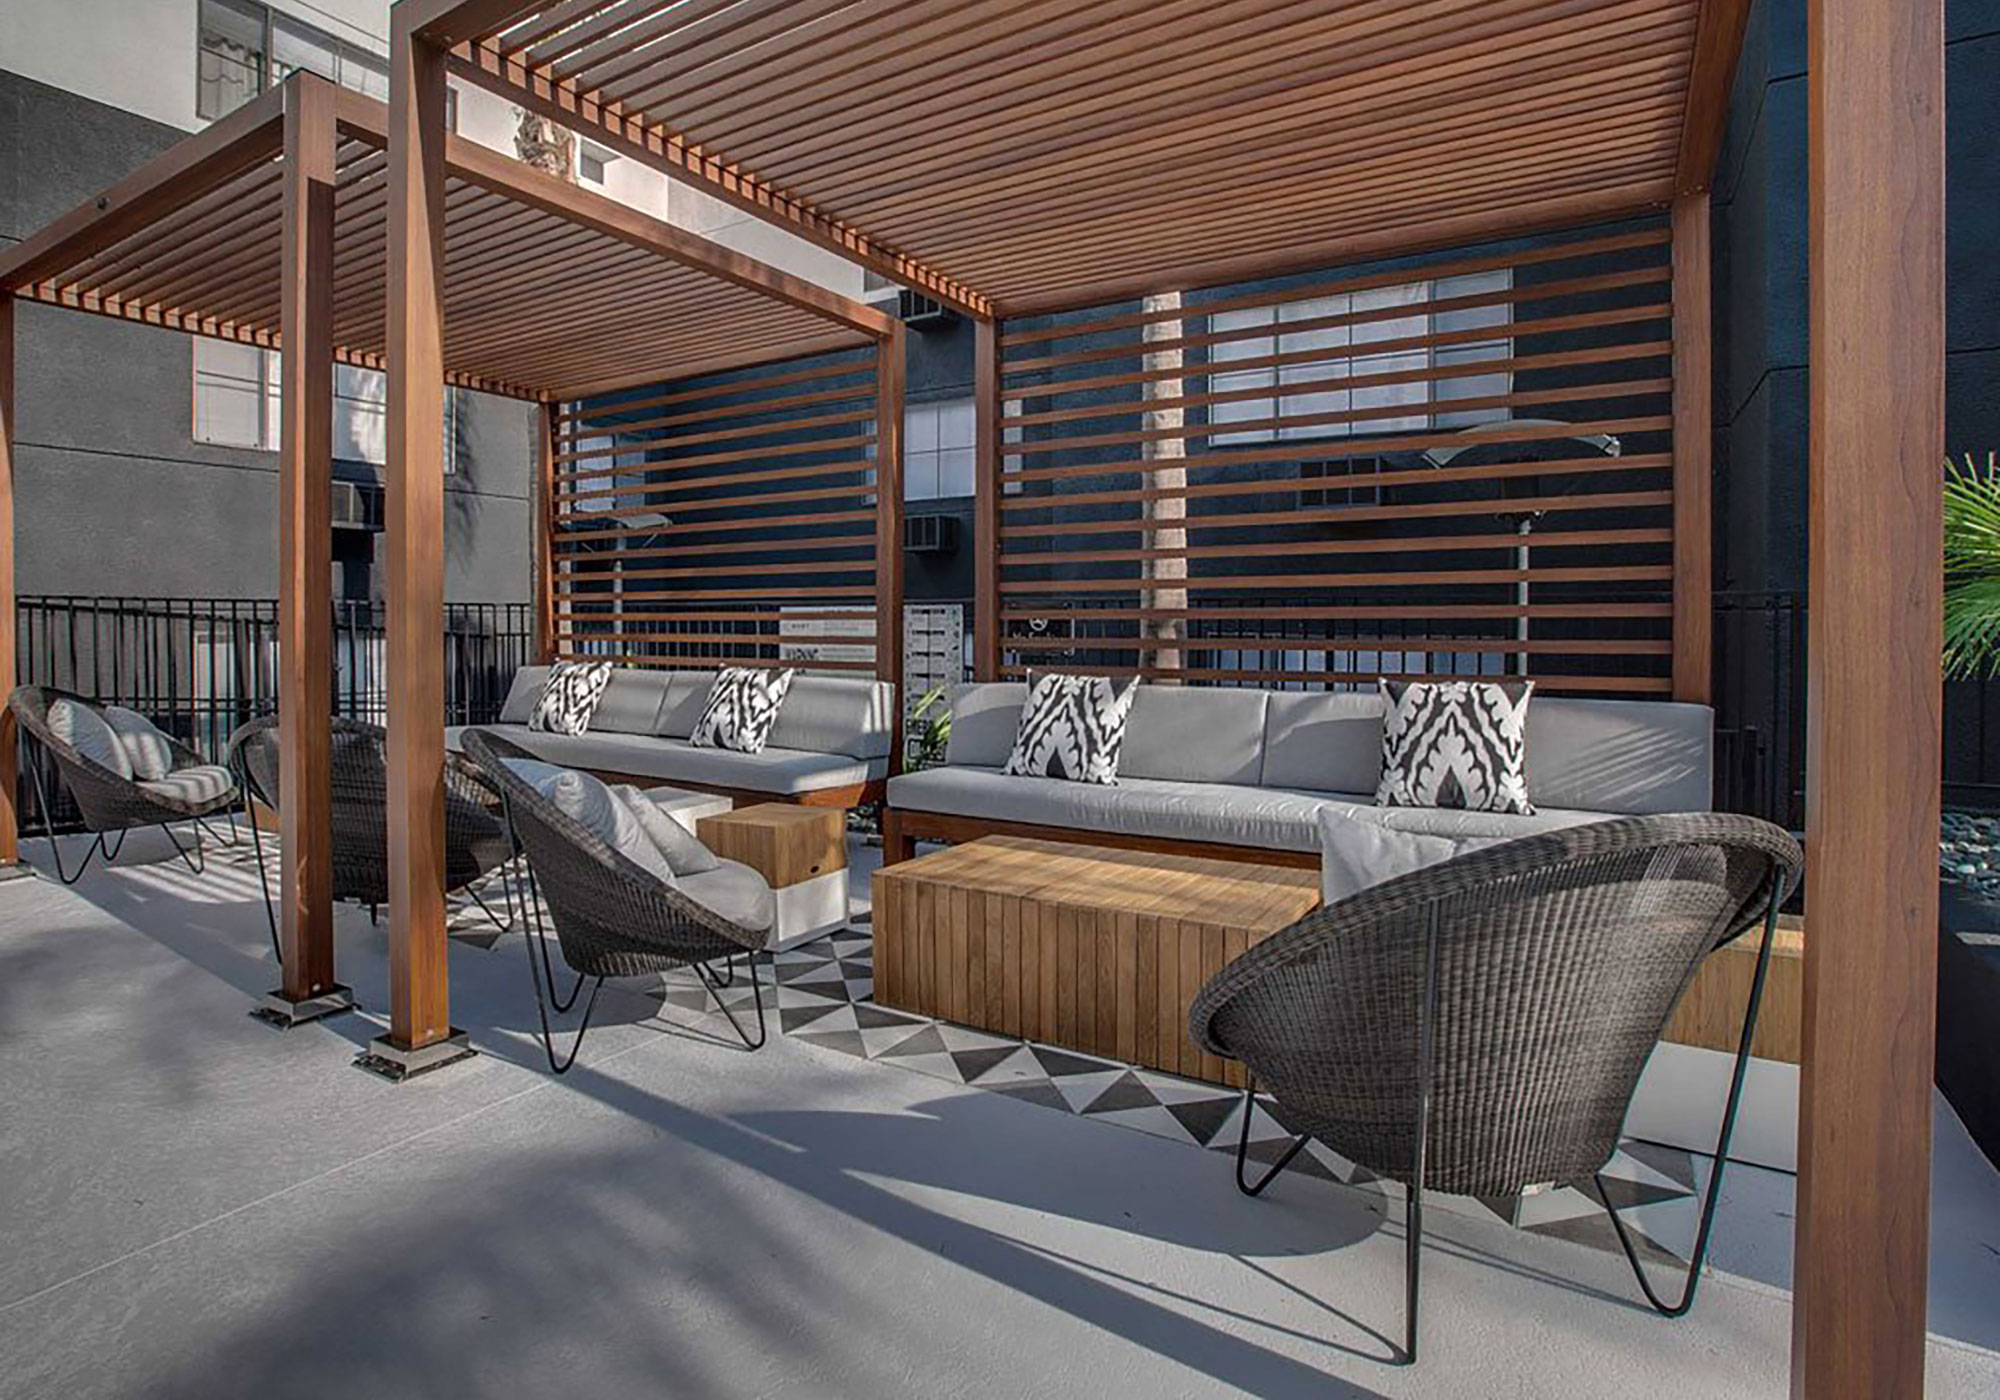 Outdoor seating under wooden slats